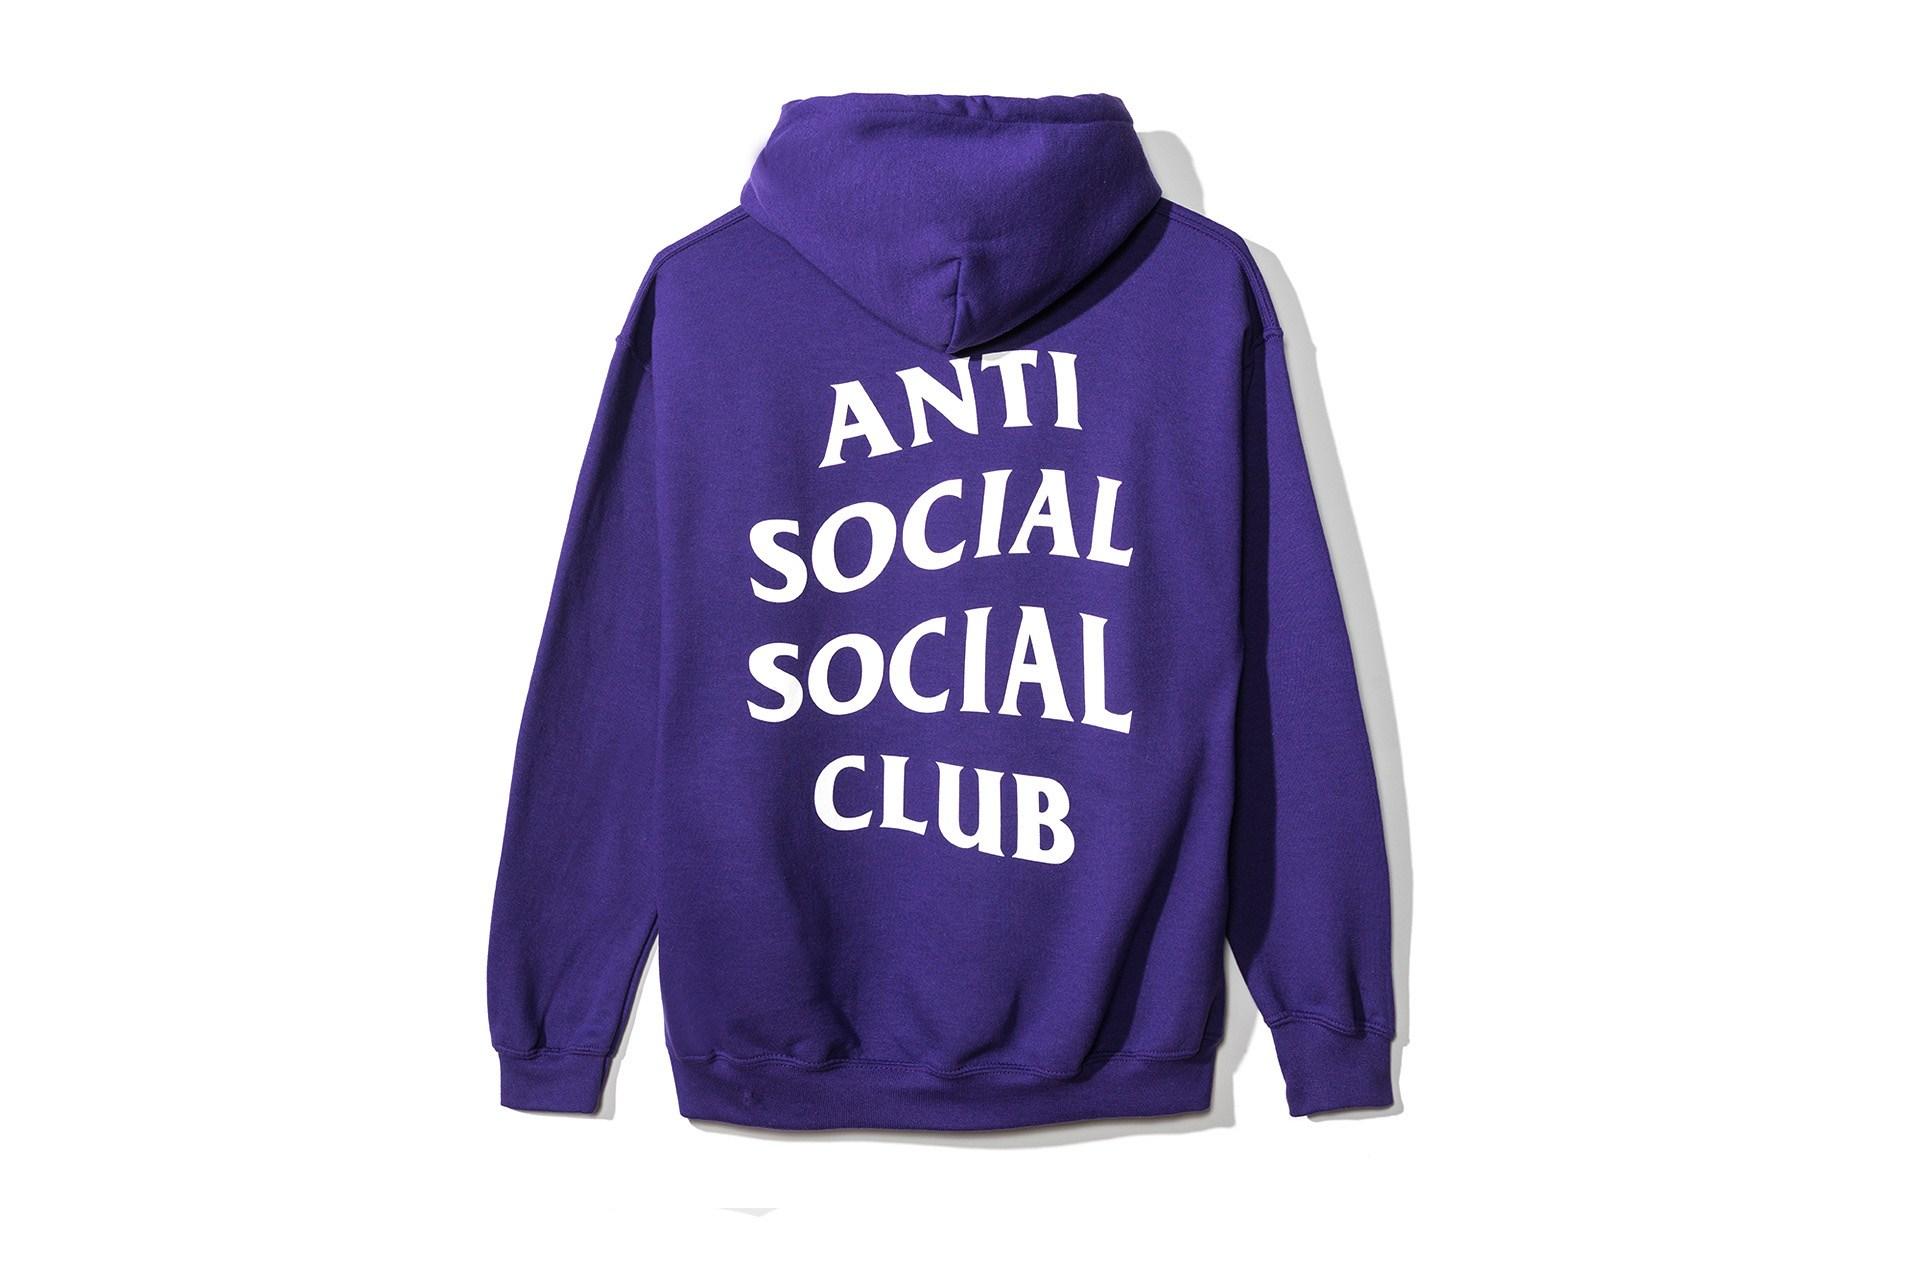 anti-social-social-club-collection-2017-spring-summer-24